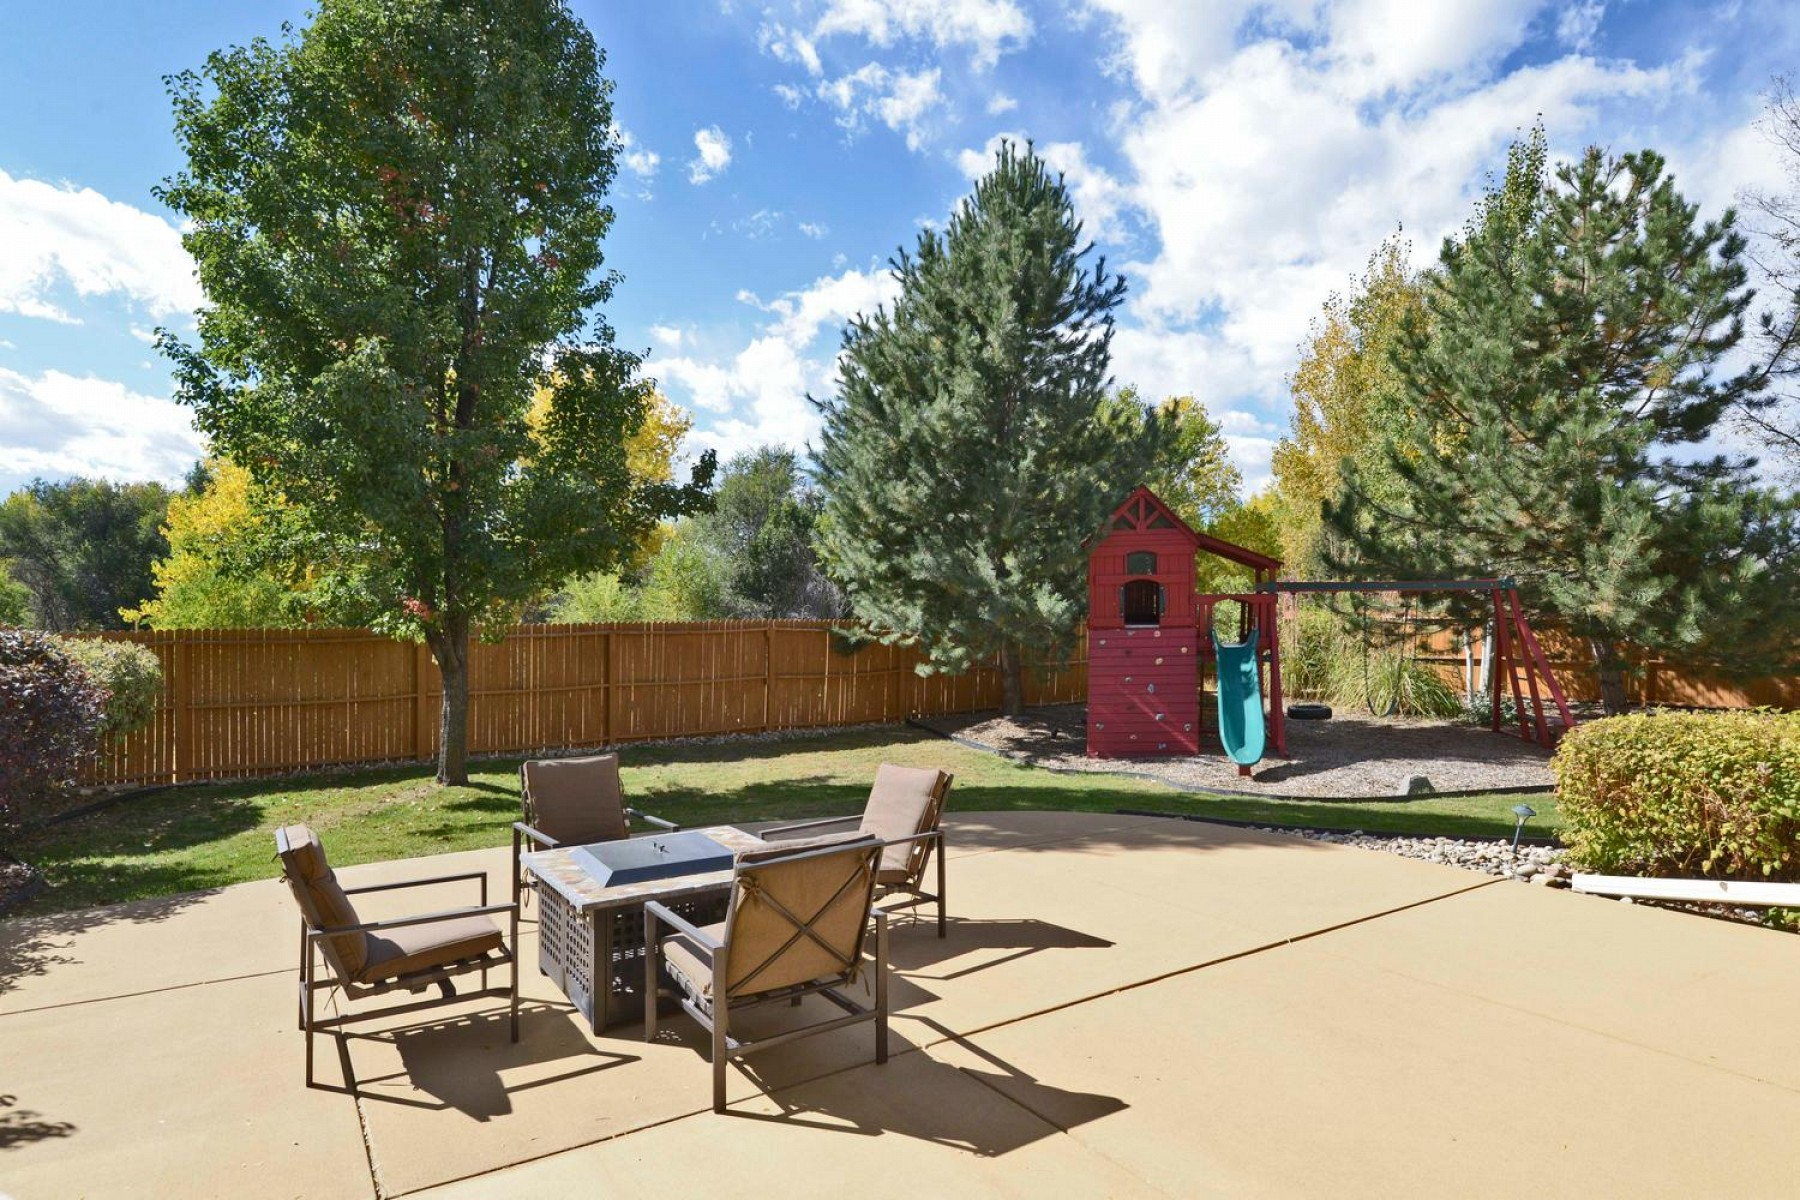 1815 S. Uinta Way, Denver, CO 80231